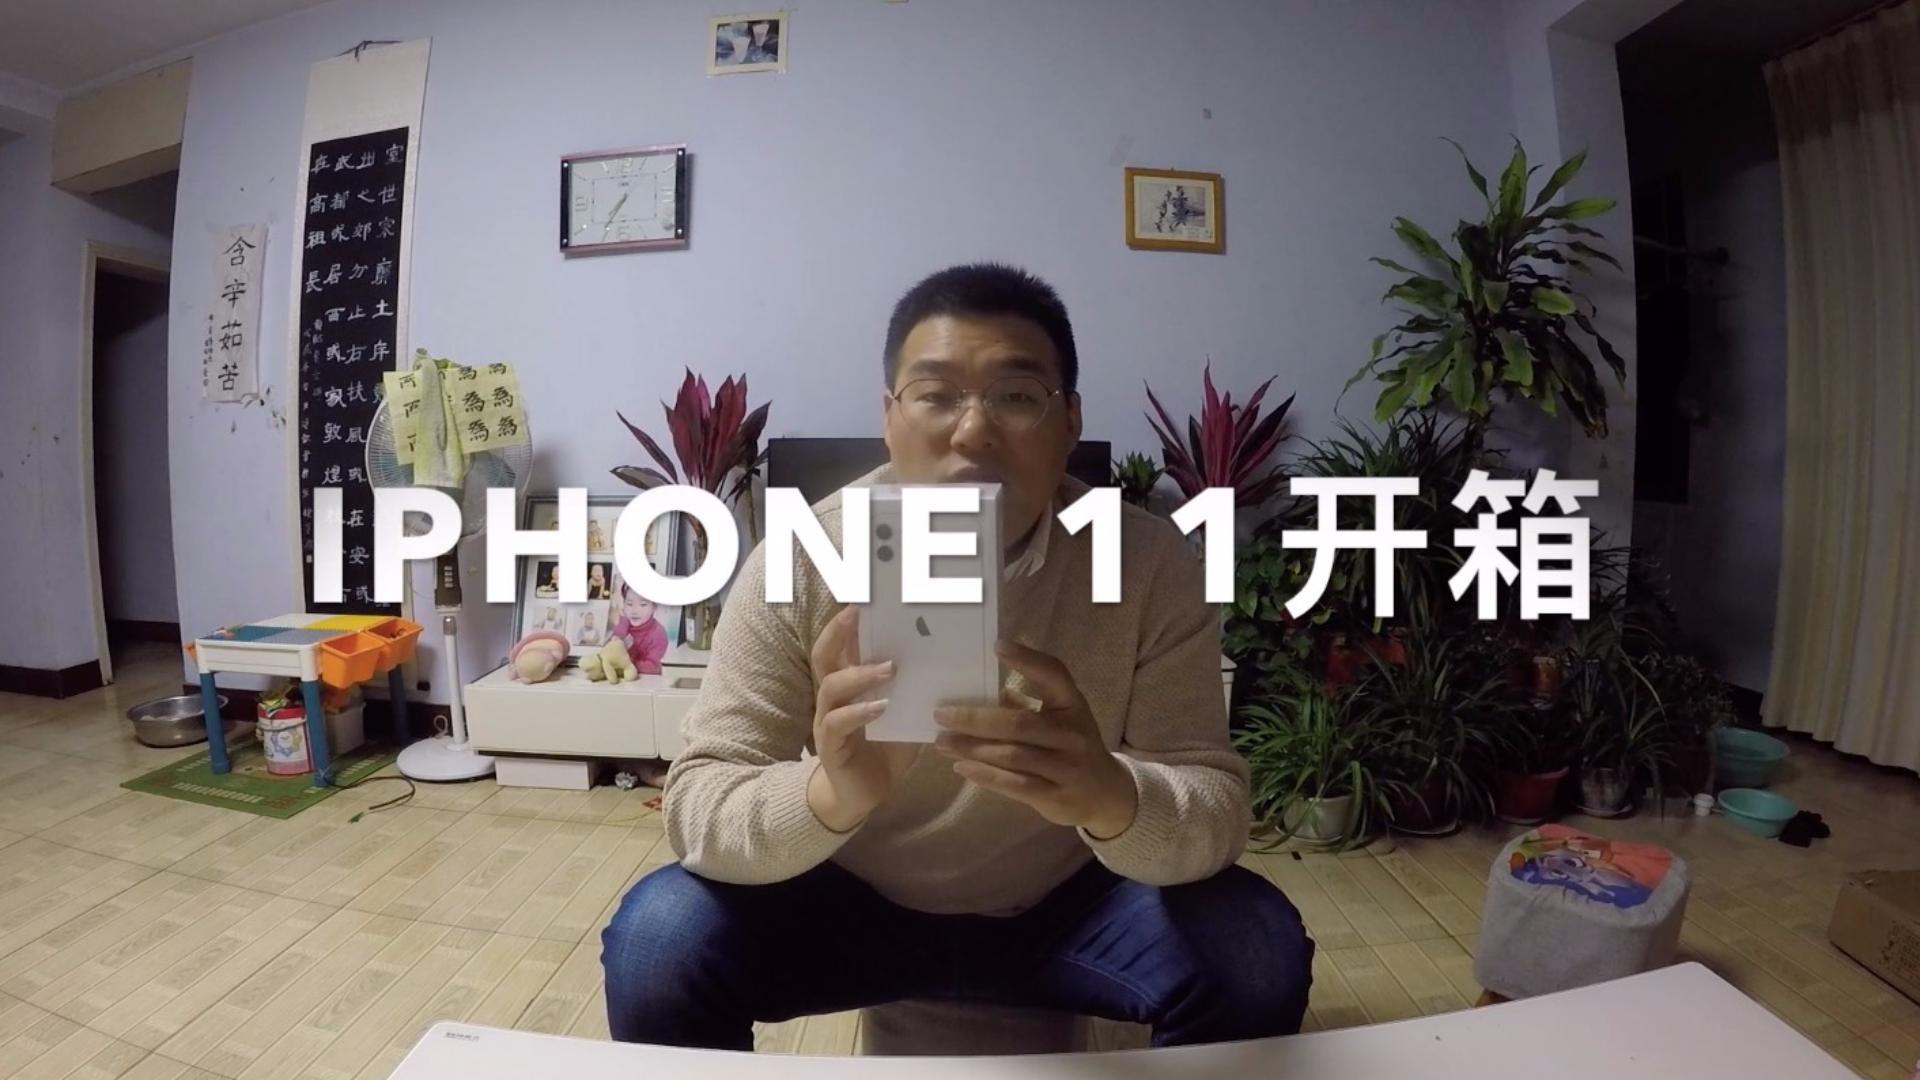 IPHONE11开箱,打开的一瞬间不亏是2019年真香机